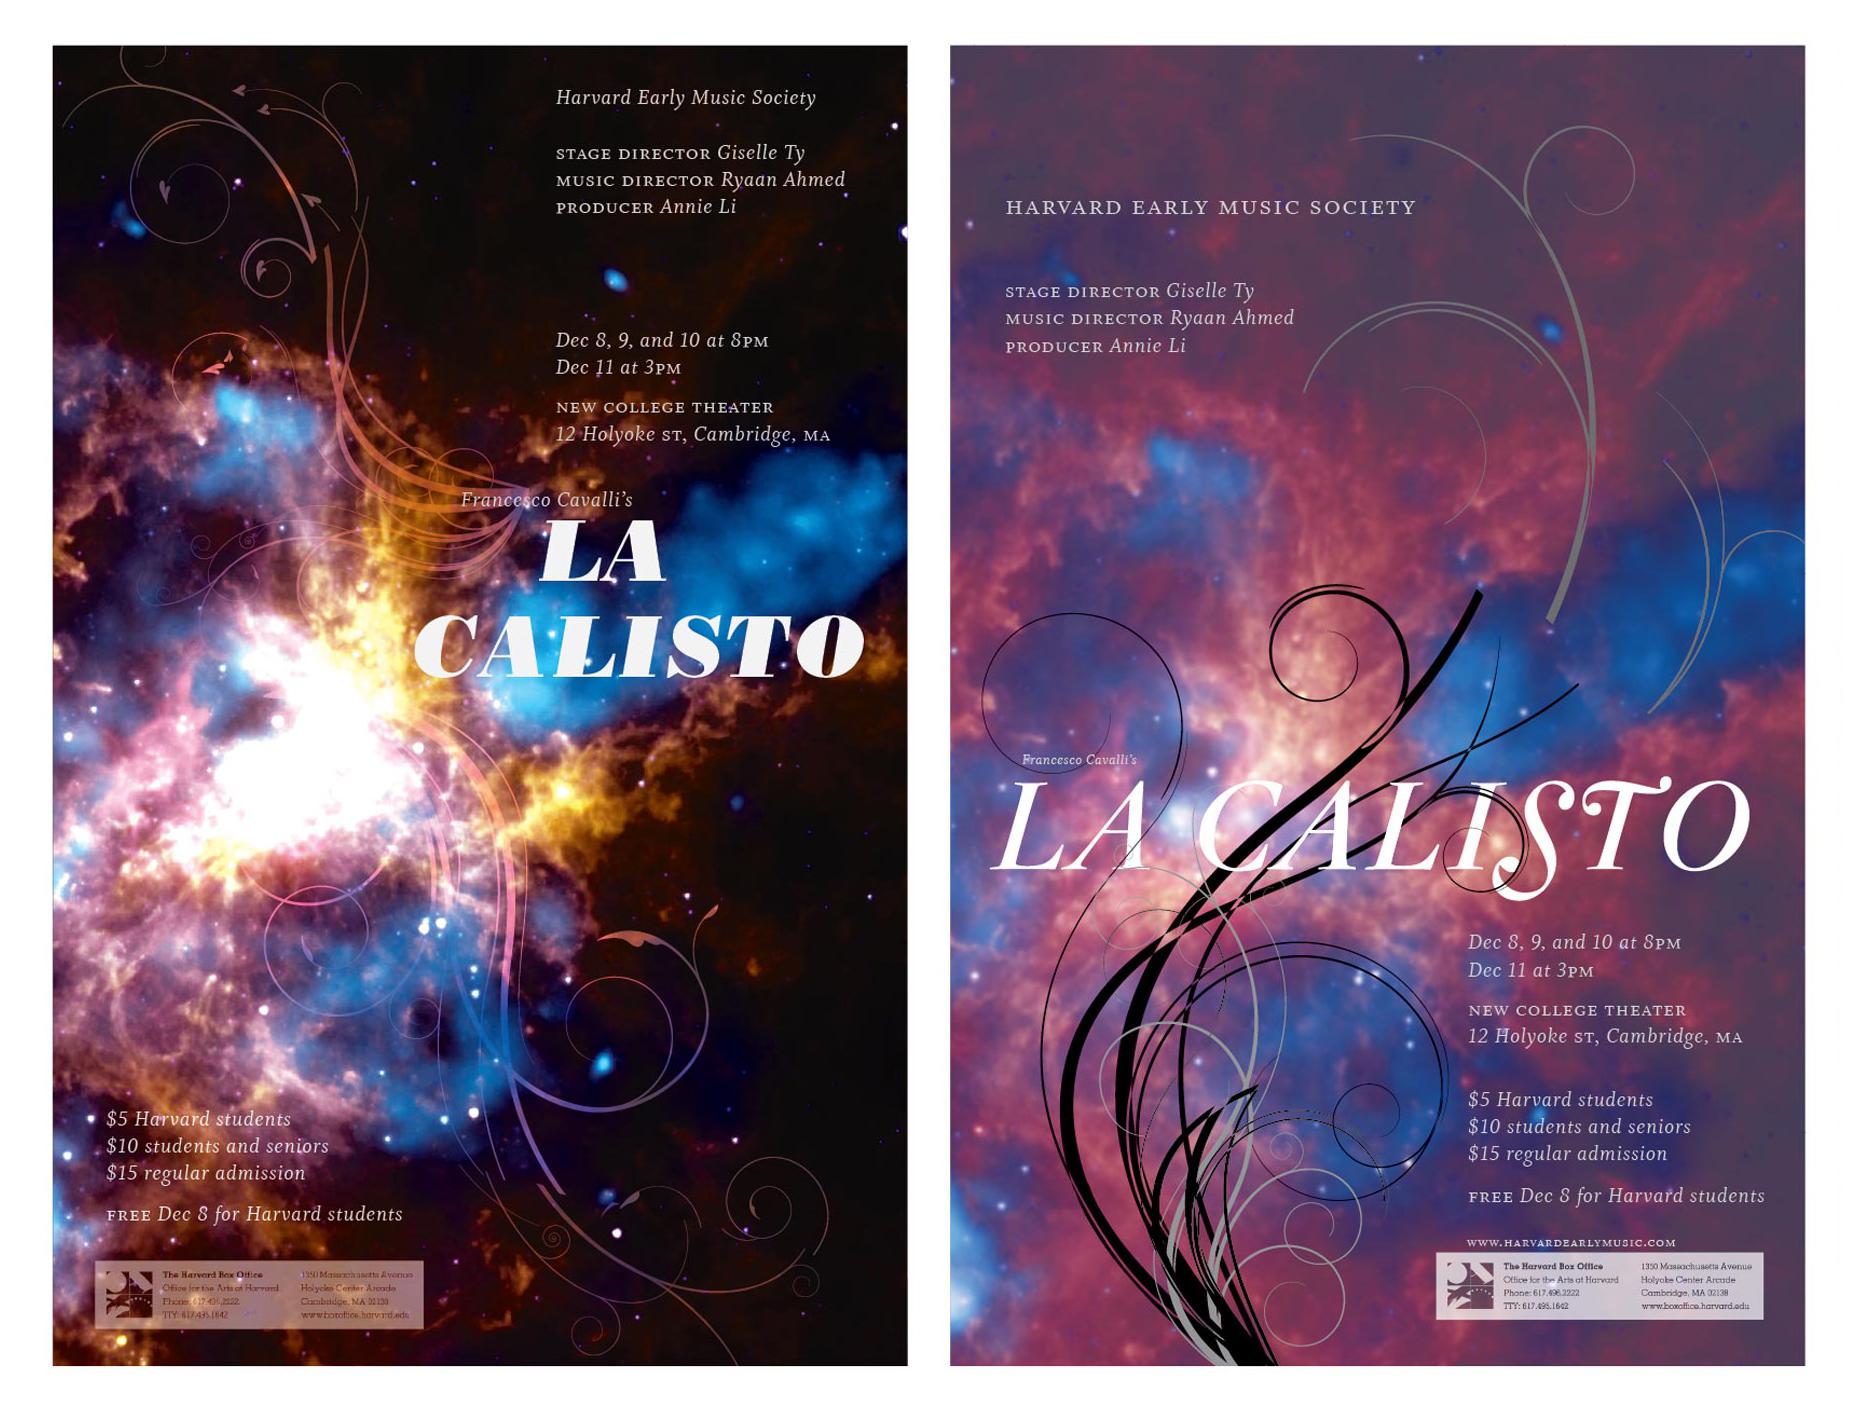 calisto-posters05@2x